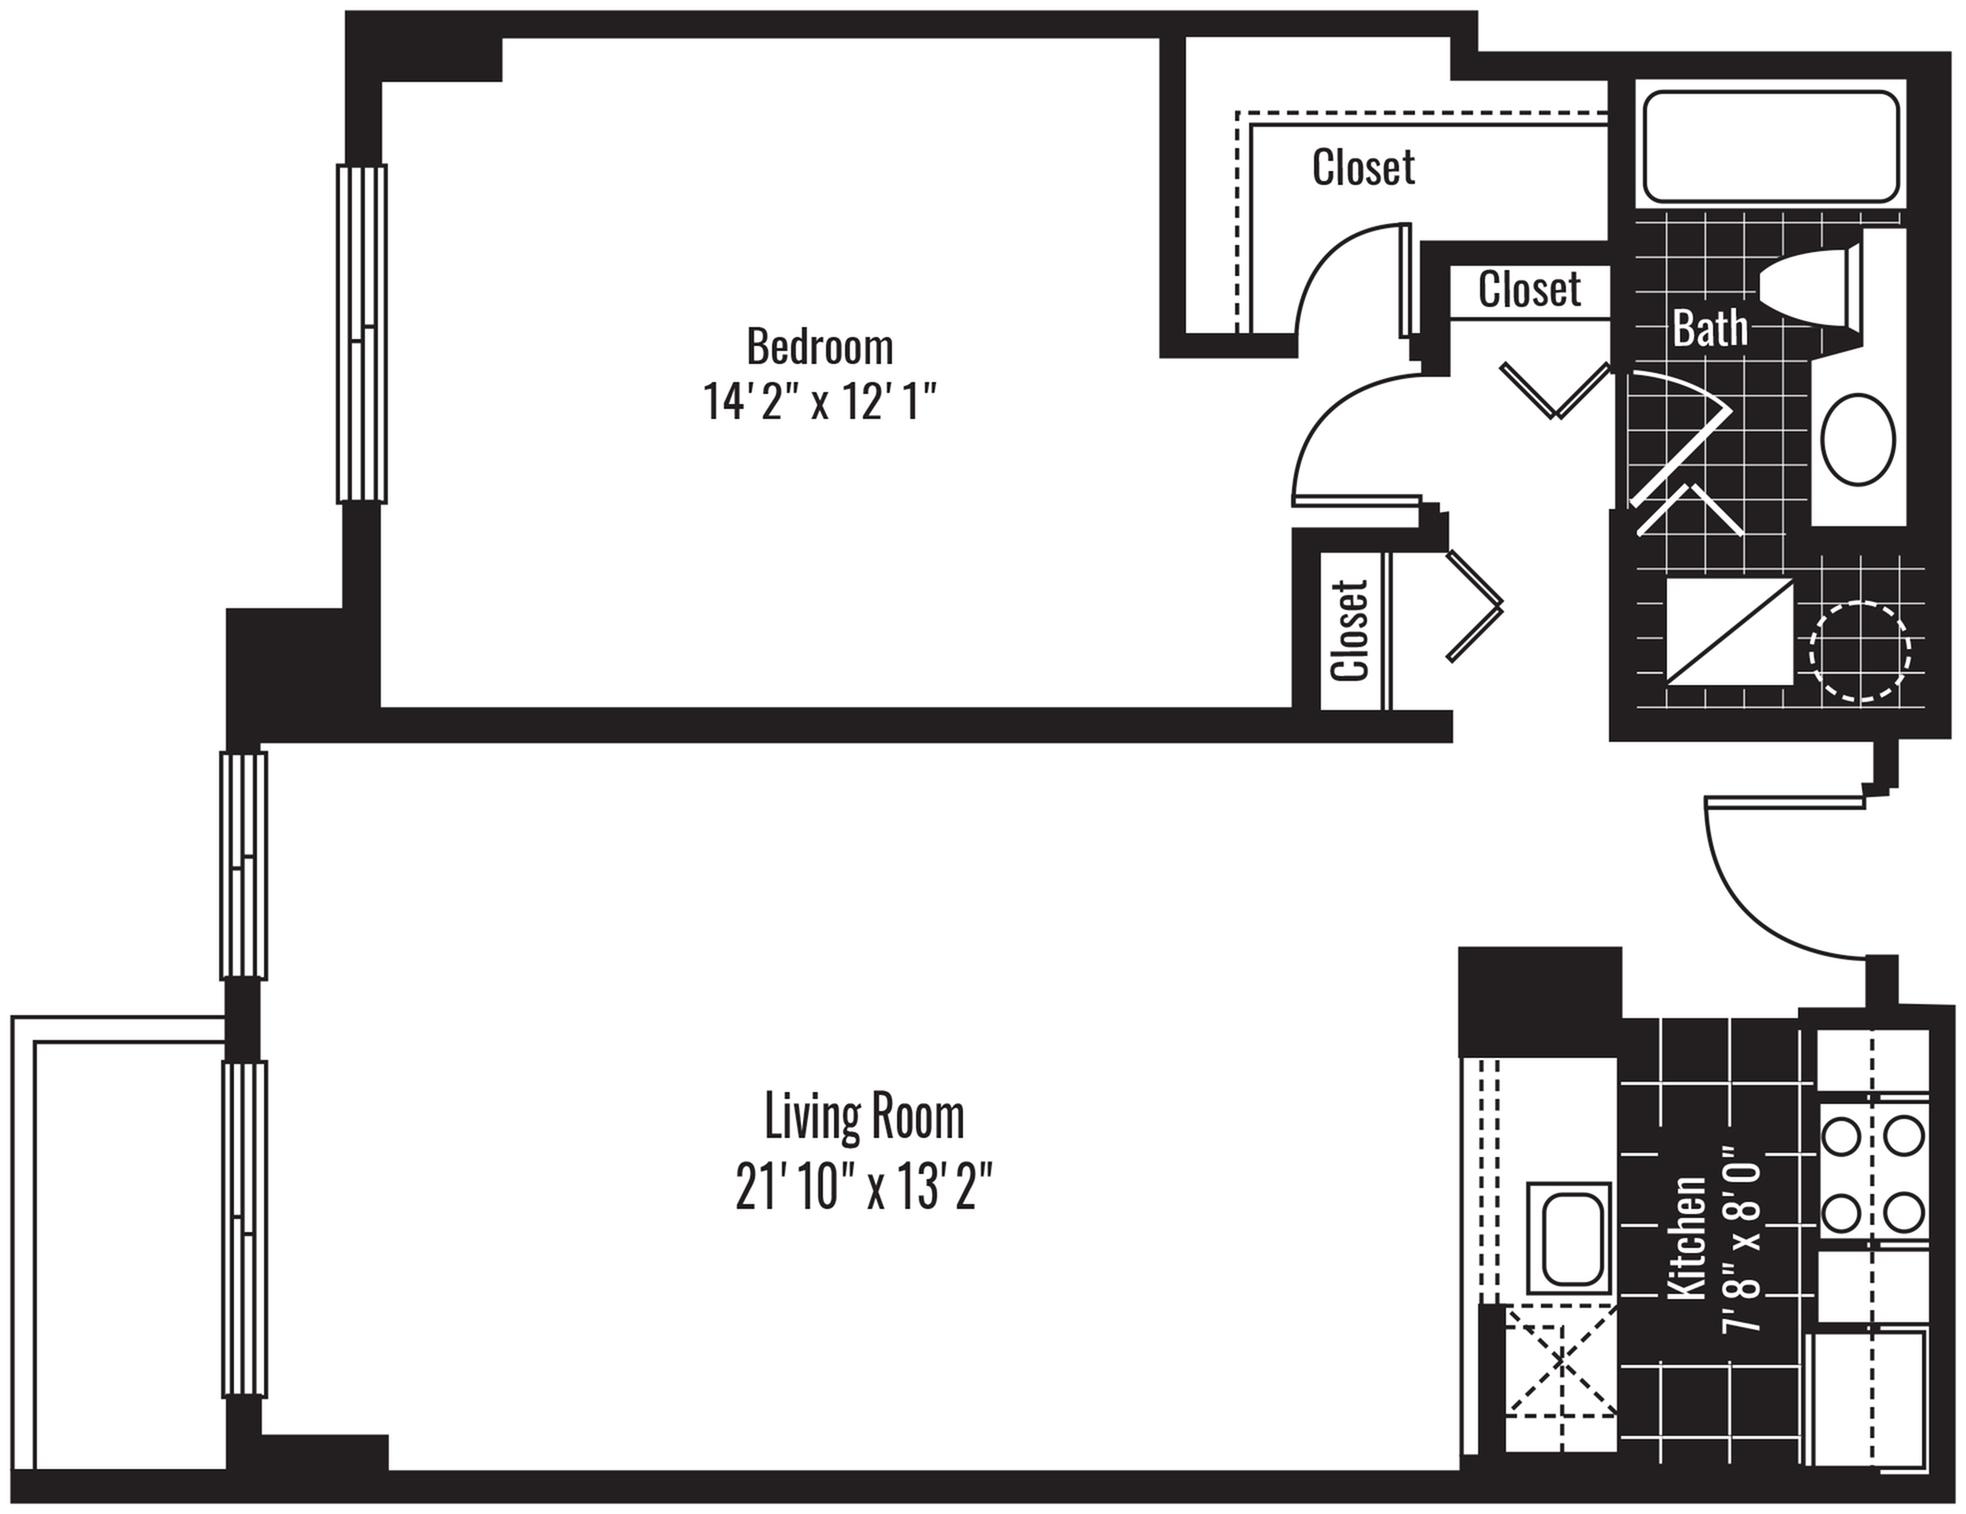 768 square foot one bedroom one bath apartment floorplan image